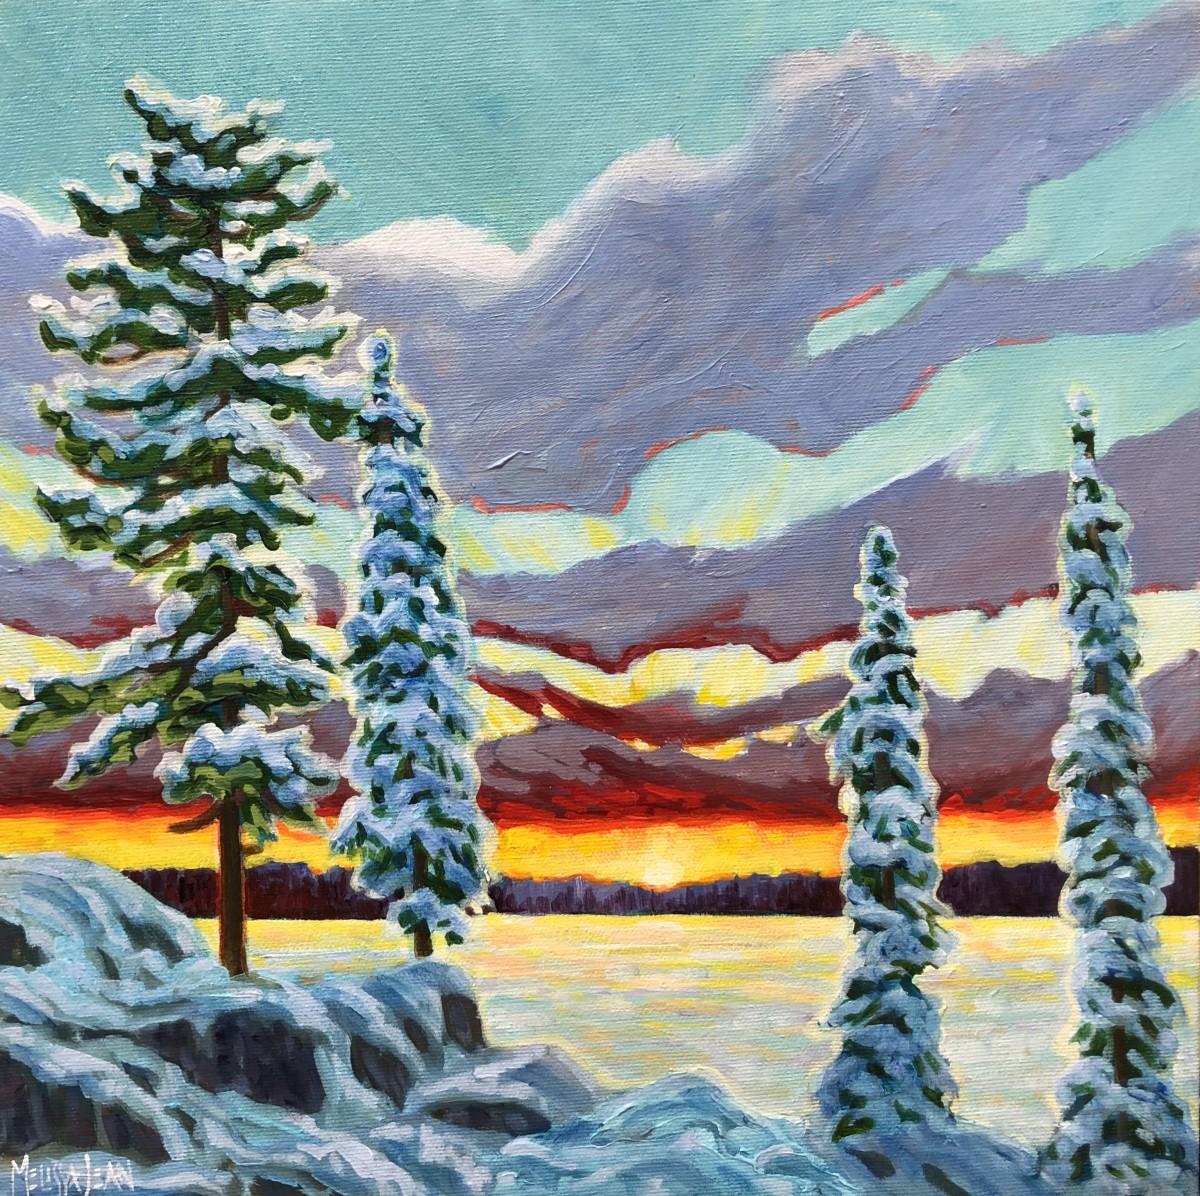 Winter Sunset by Melissa Jean